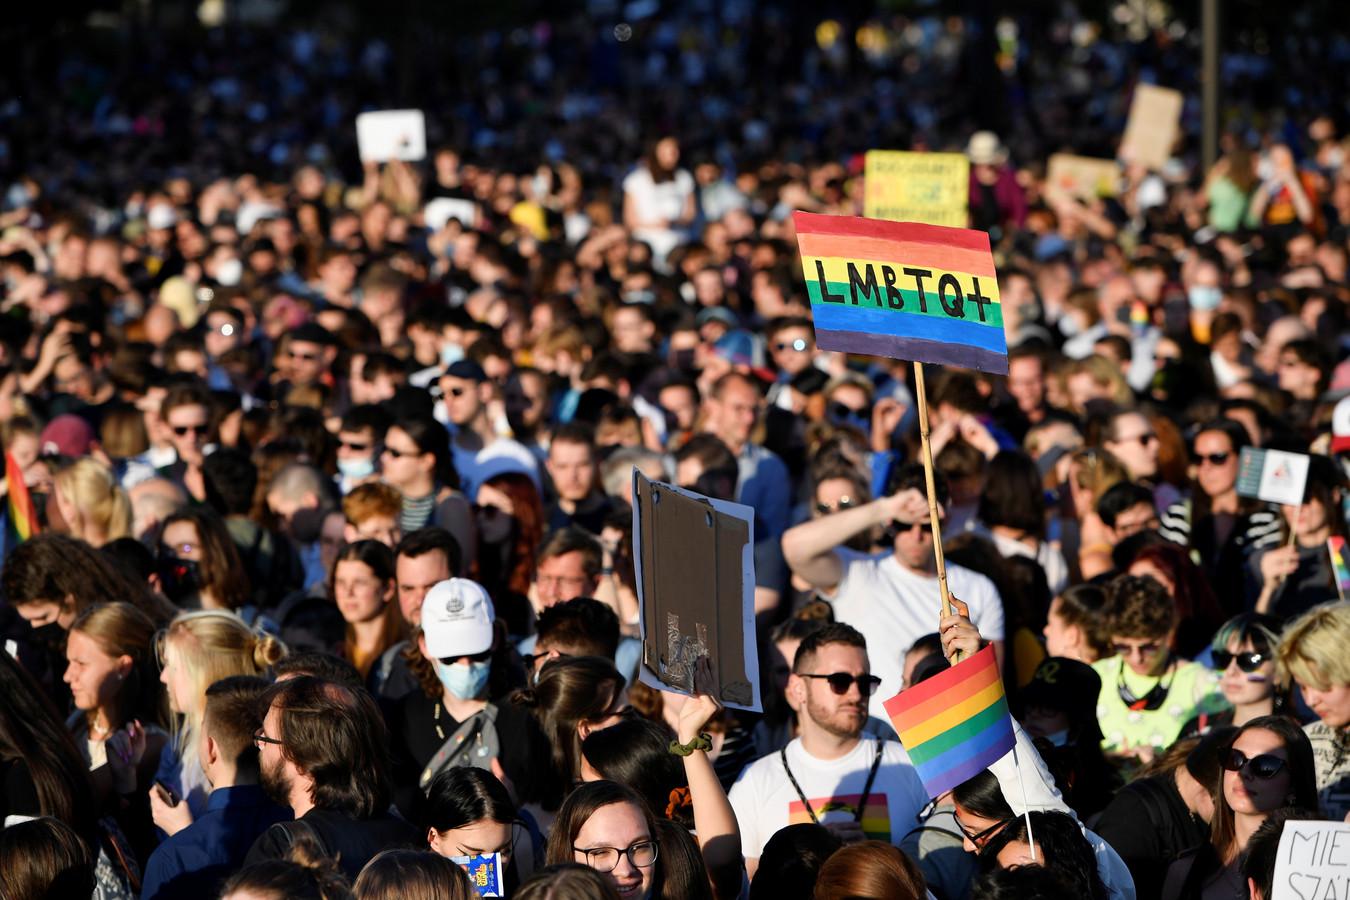 Gisteren demonstreerden duizenden mensen in Boedapest tegen de omstreden wet van Viktor Orbán.